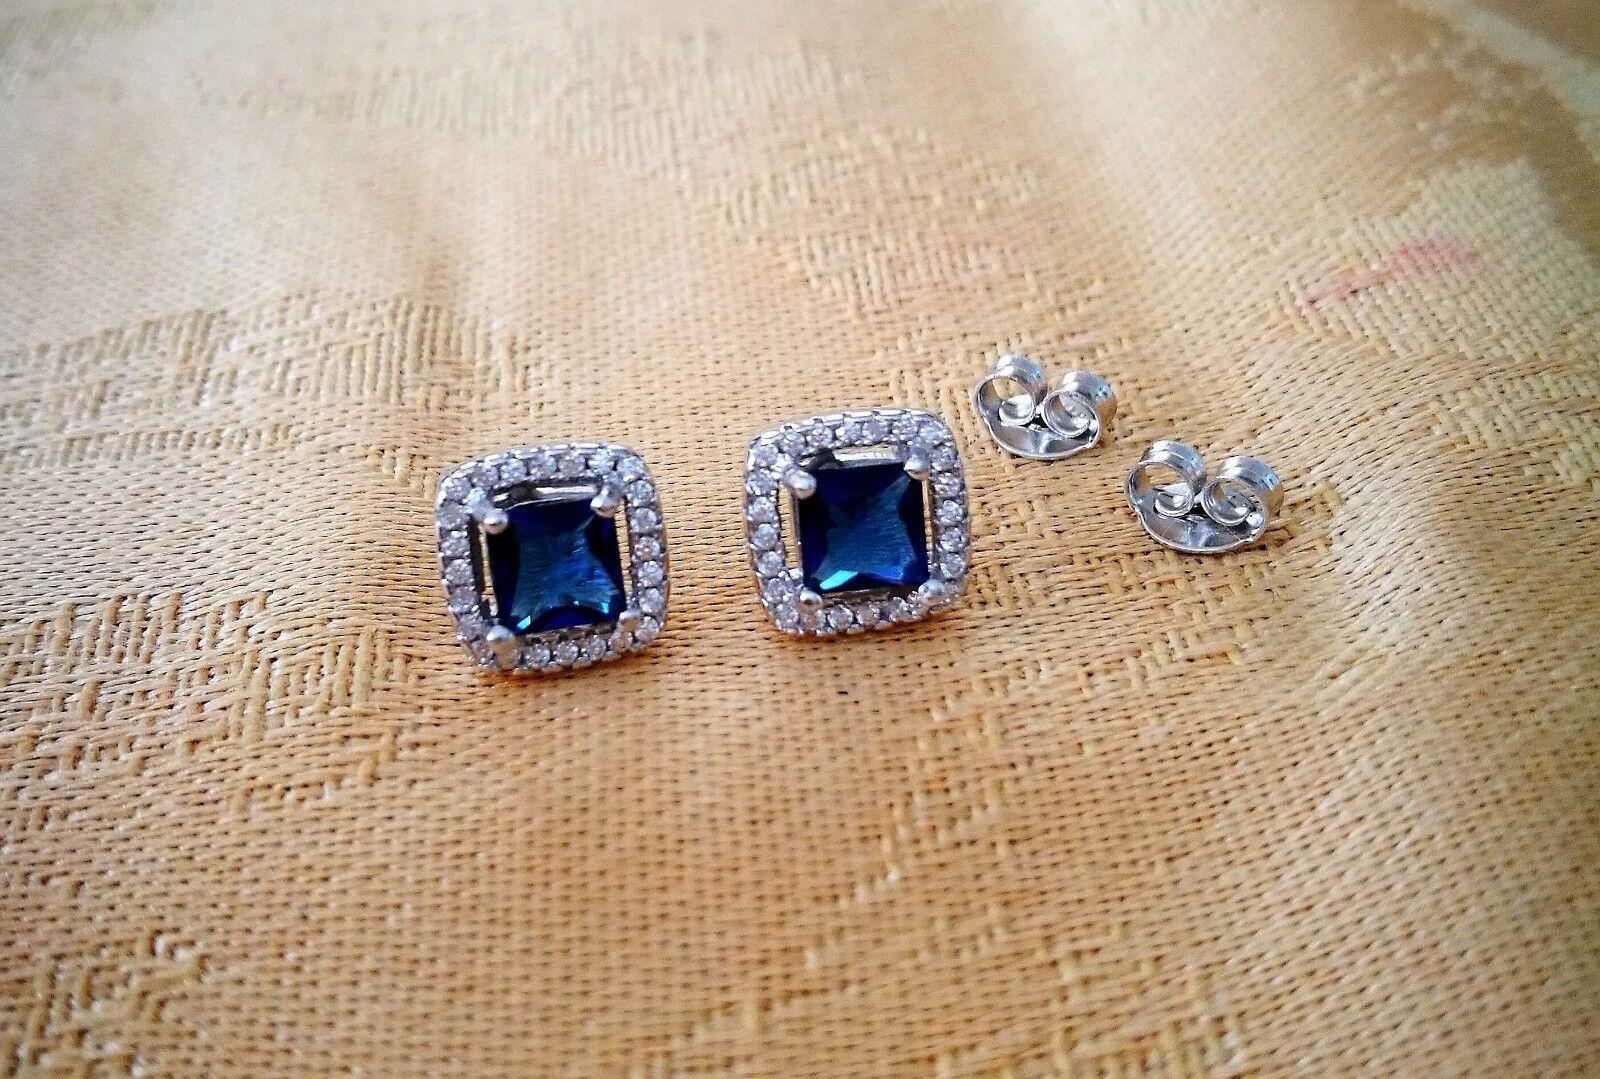 2 Ct Diamond Halo Stud Earrings with Blue Sapphire Women's Studs 14K White Gold 5